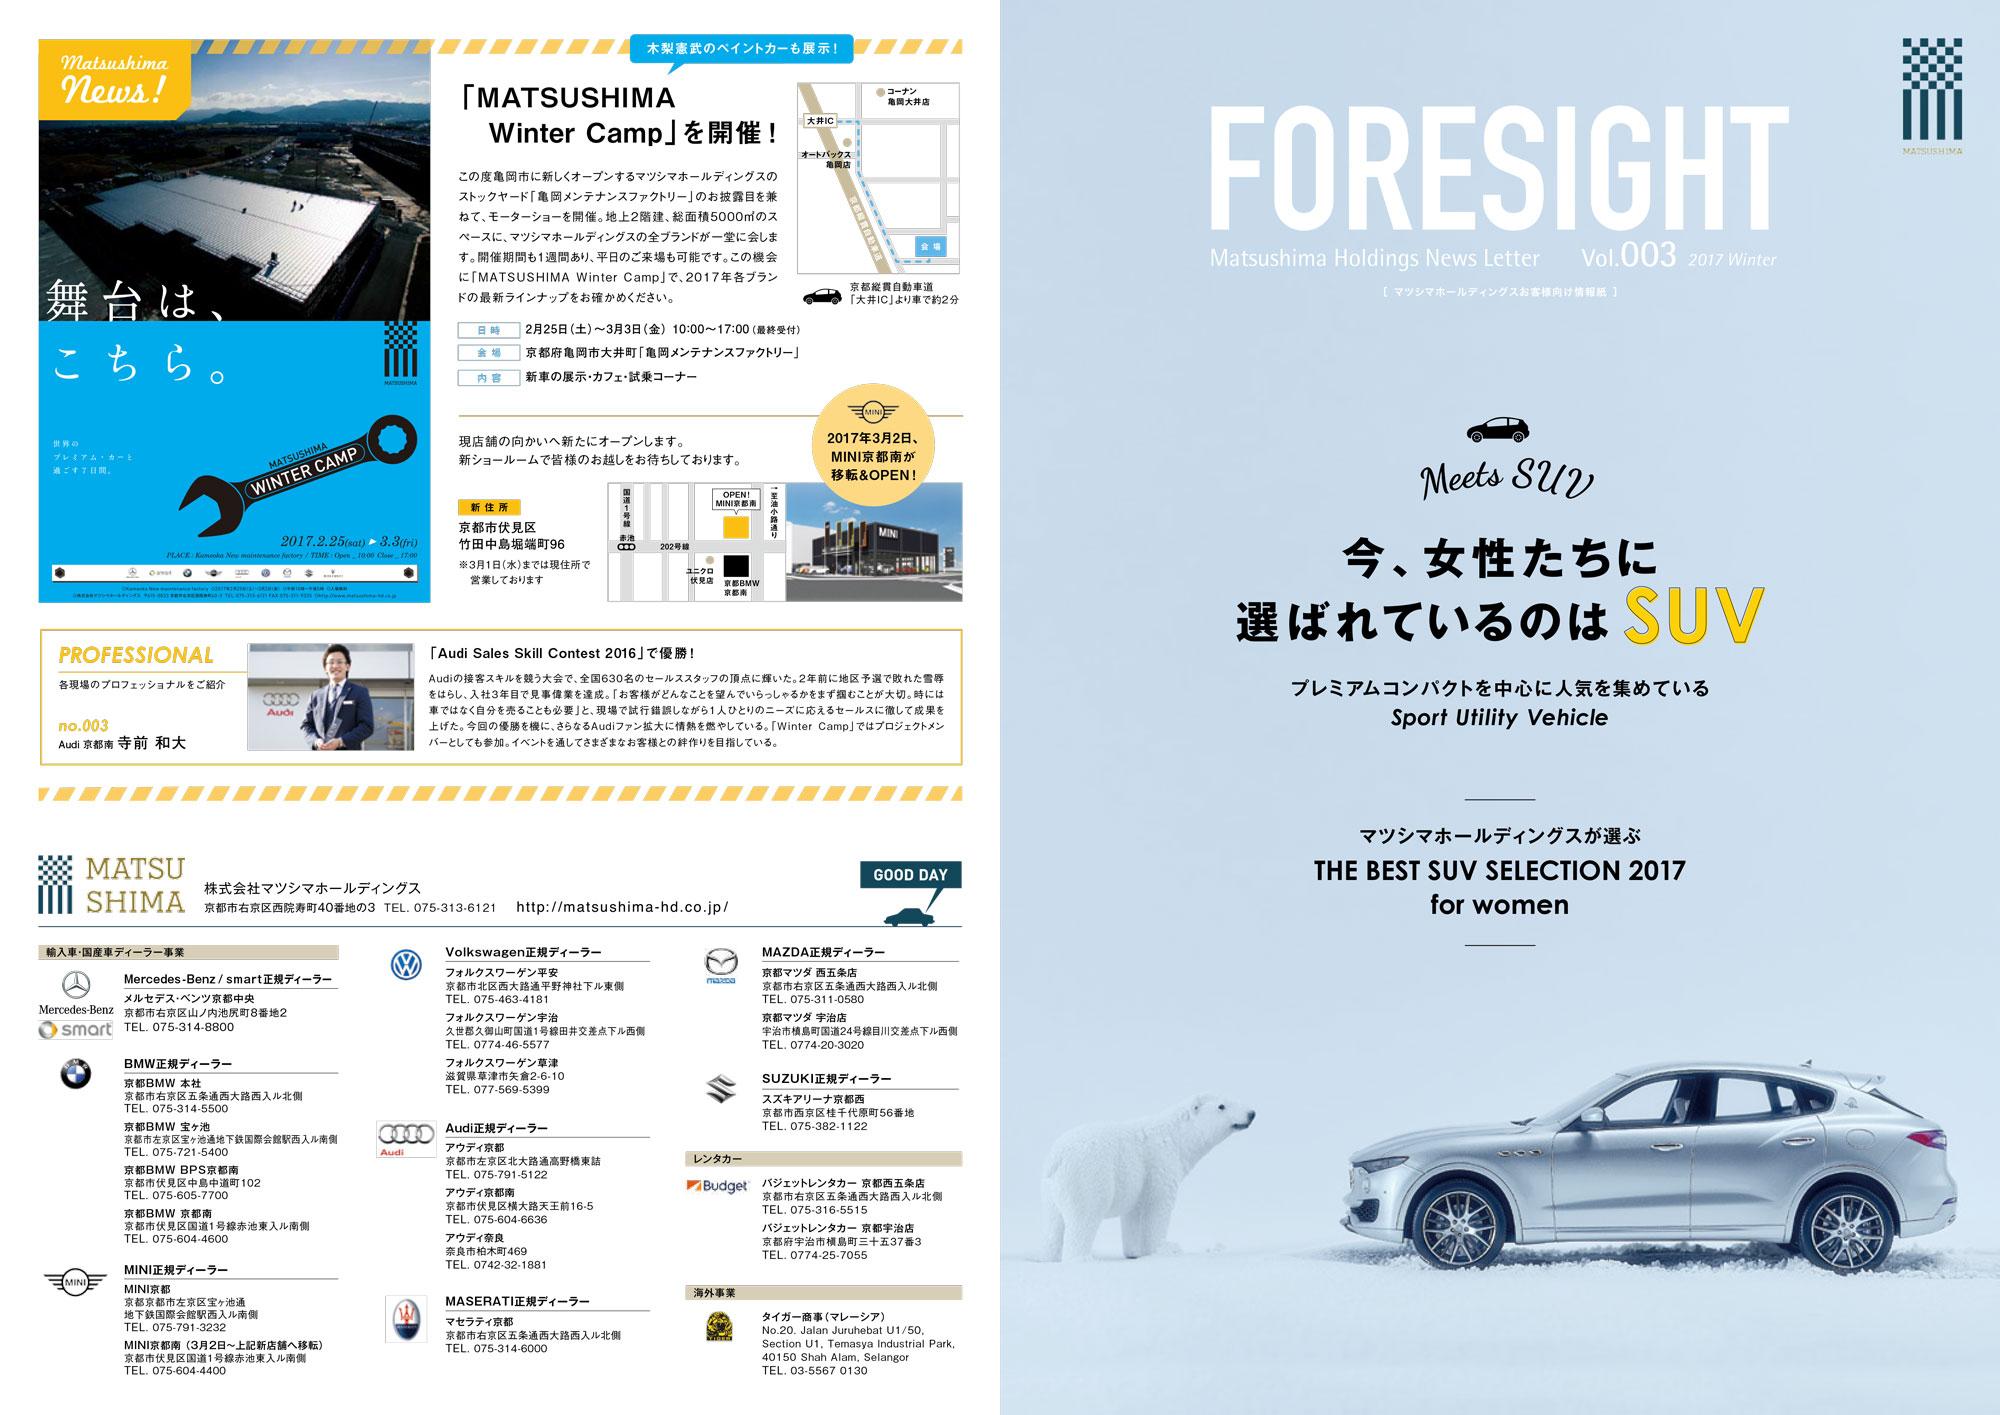 foresight03_2017winter-1